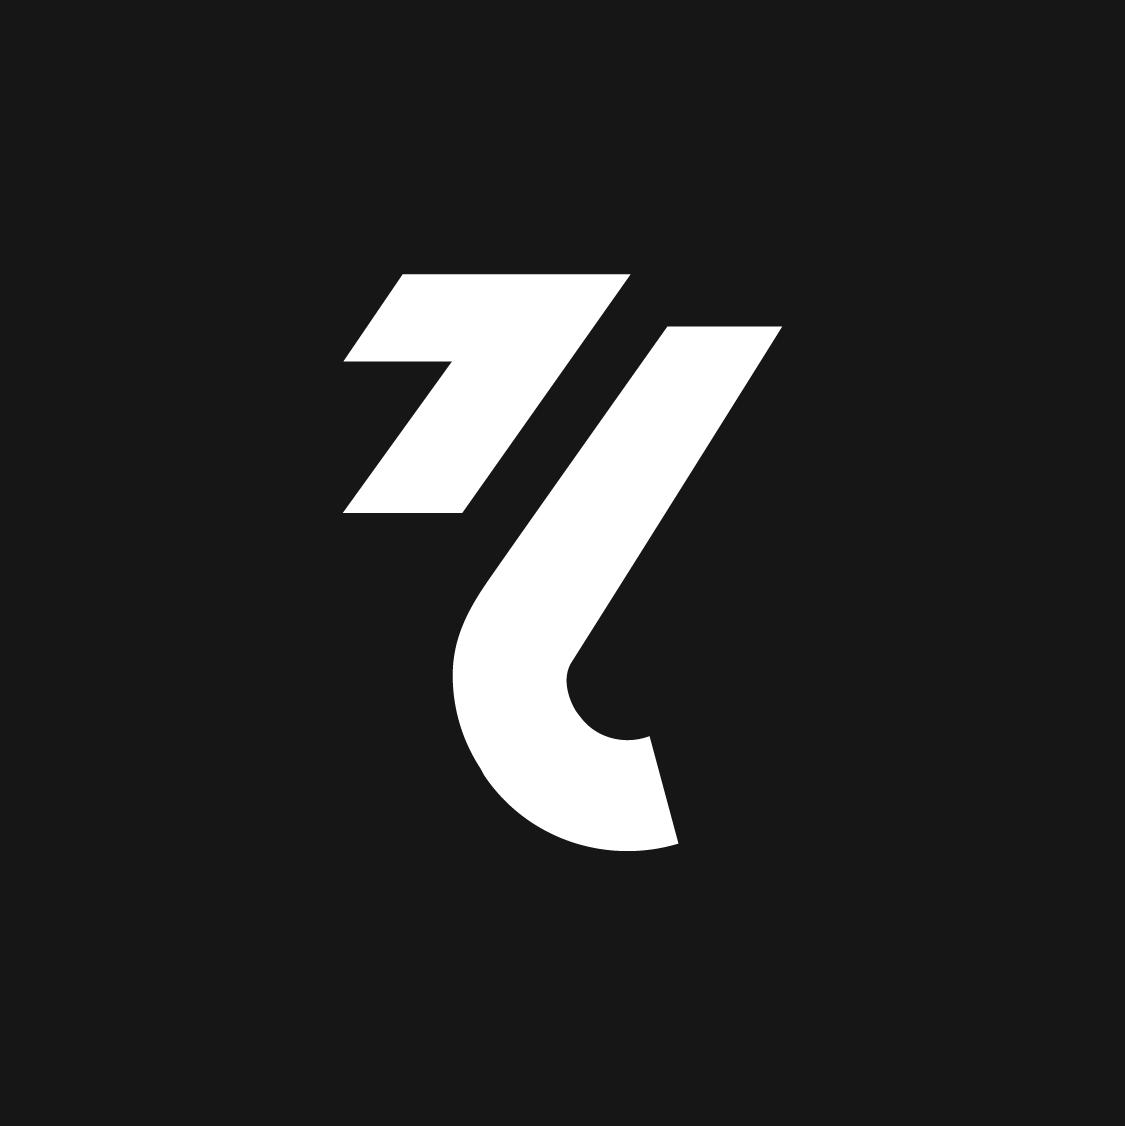 all-logos-2020-64